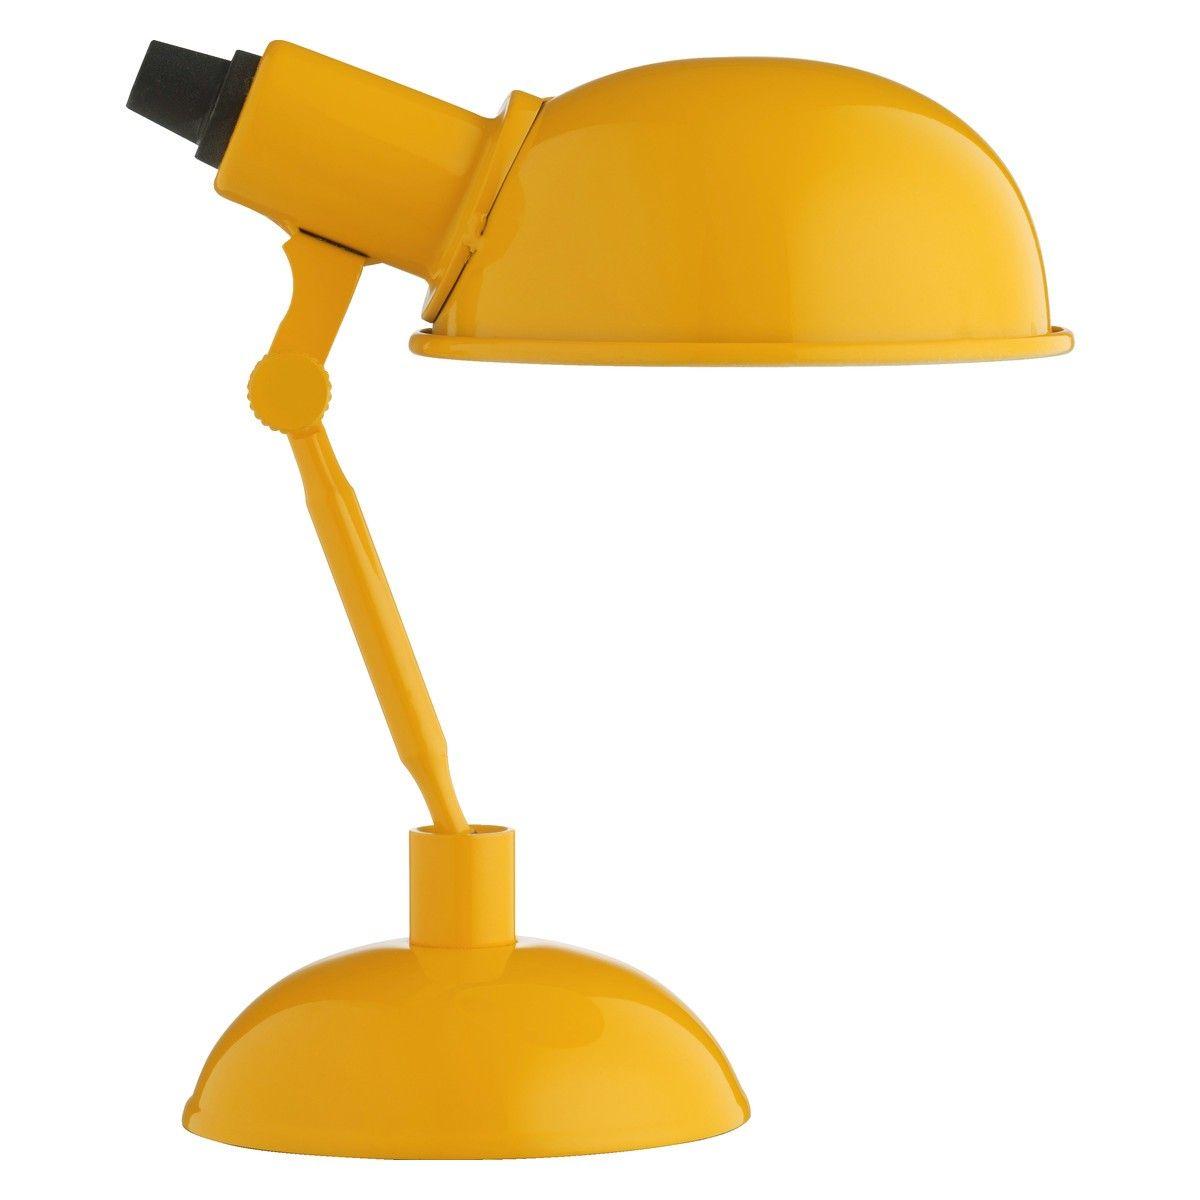 Tommy Yellow Metal Desk Lamp Metal Desk Lamps Desk Lamp Yellow Desk Lamps